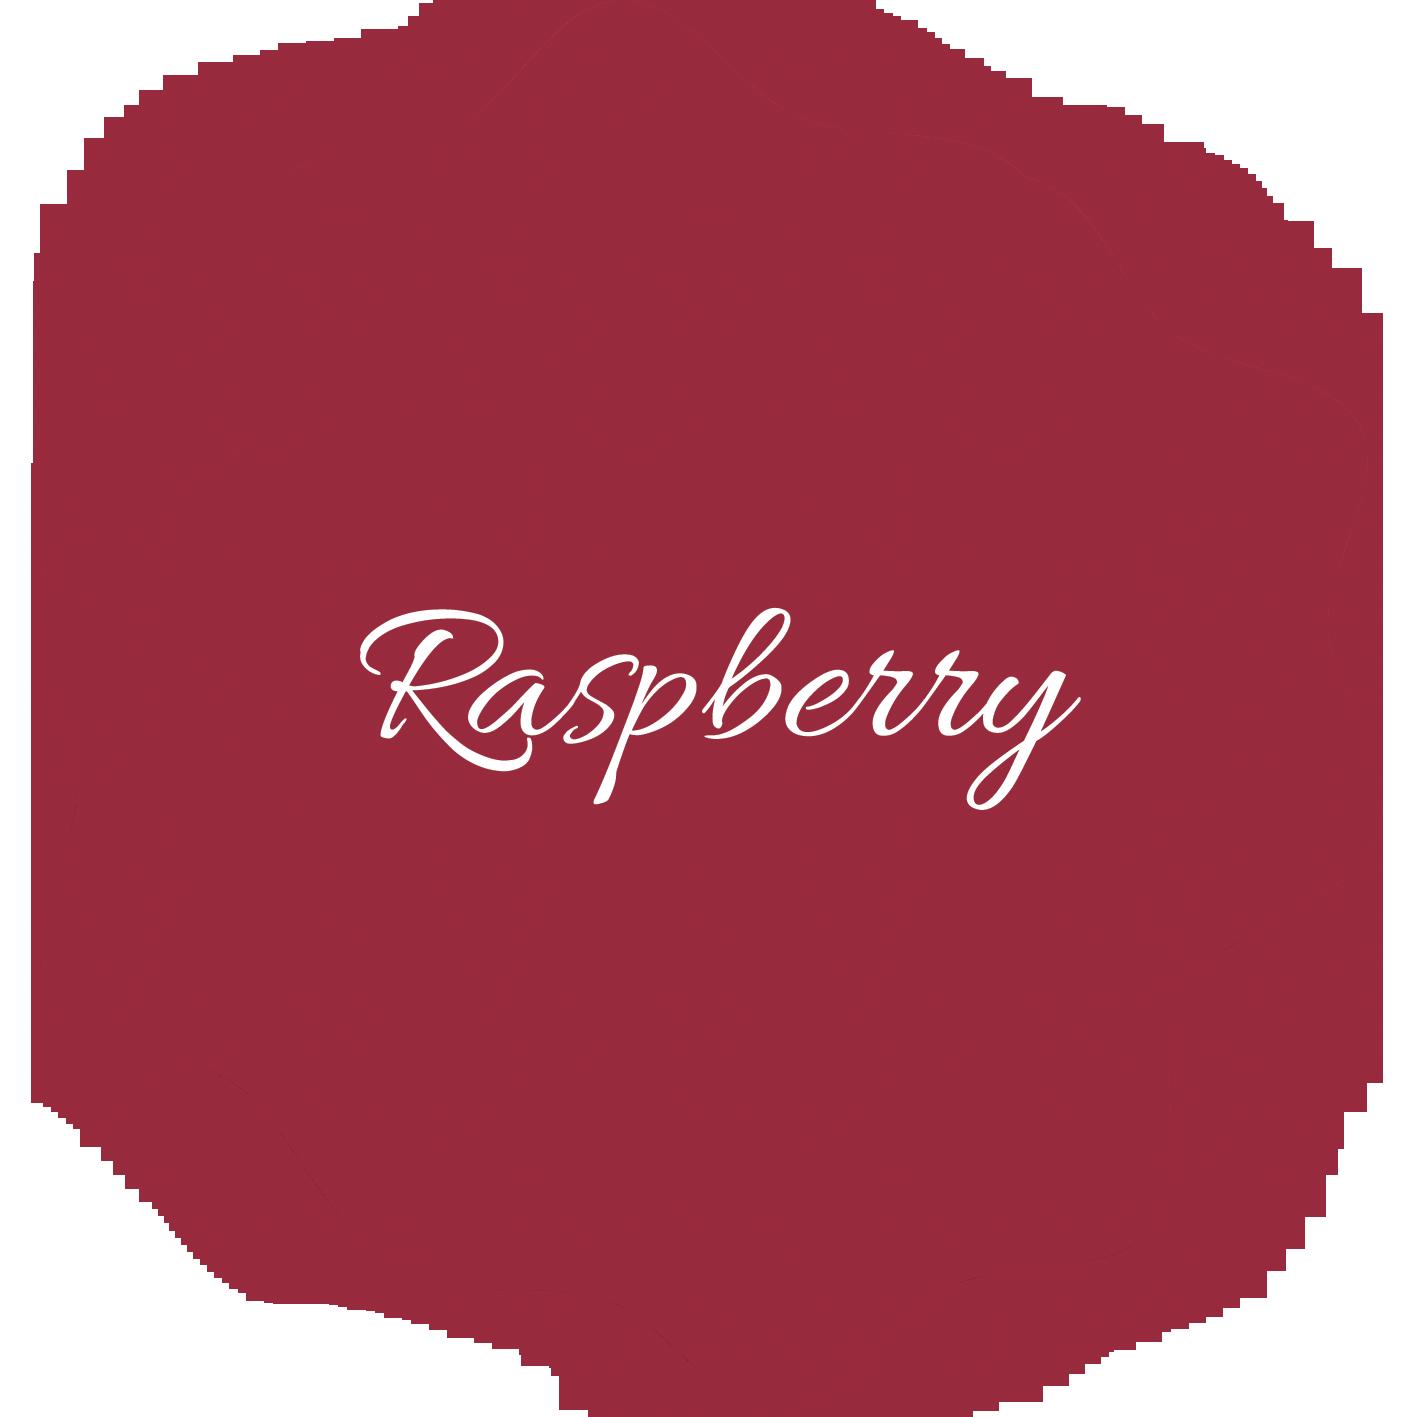 Raspberry.png